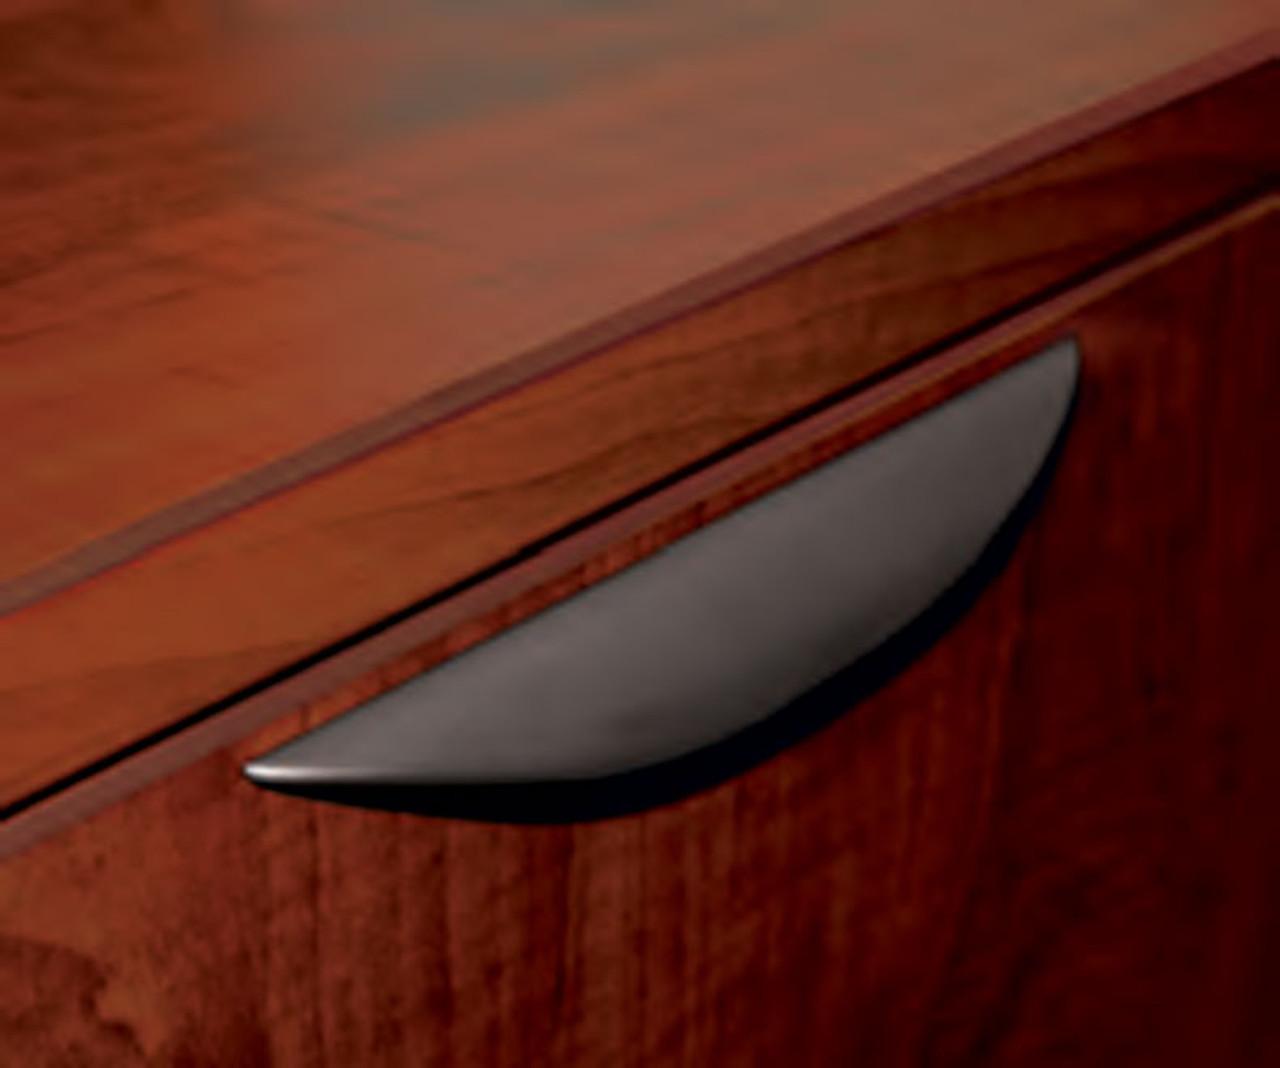 3pc L Shaped Modern Acrylic Panel Office Reception Desk, #OT-SUL-R23